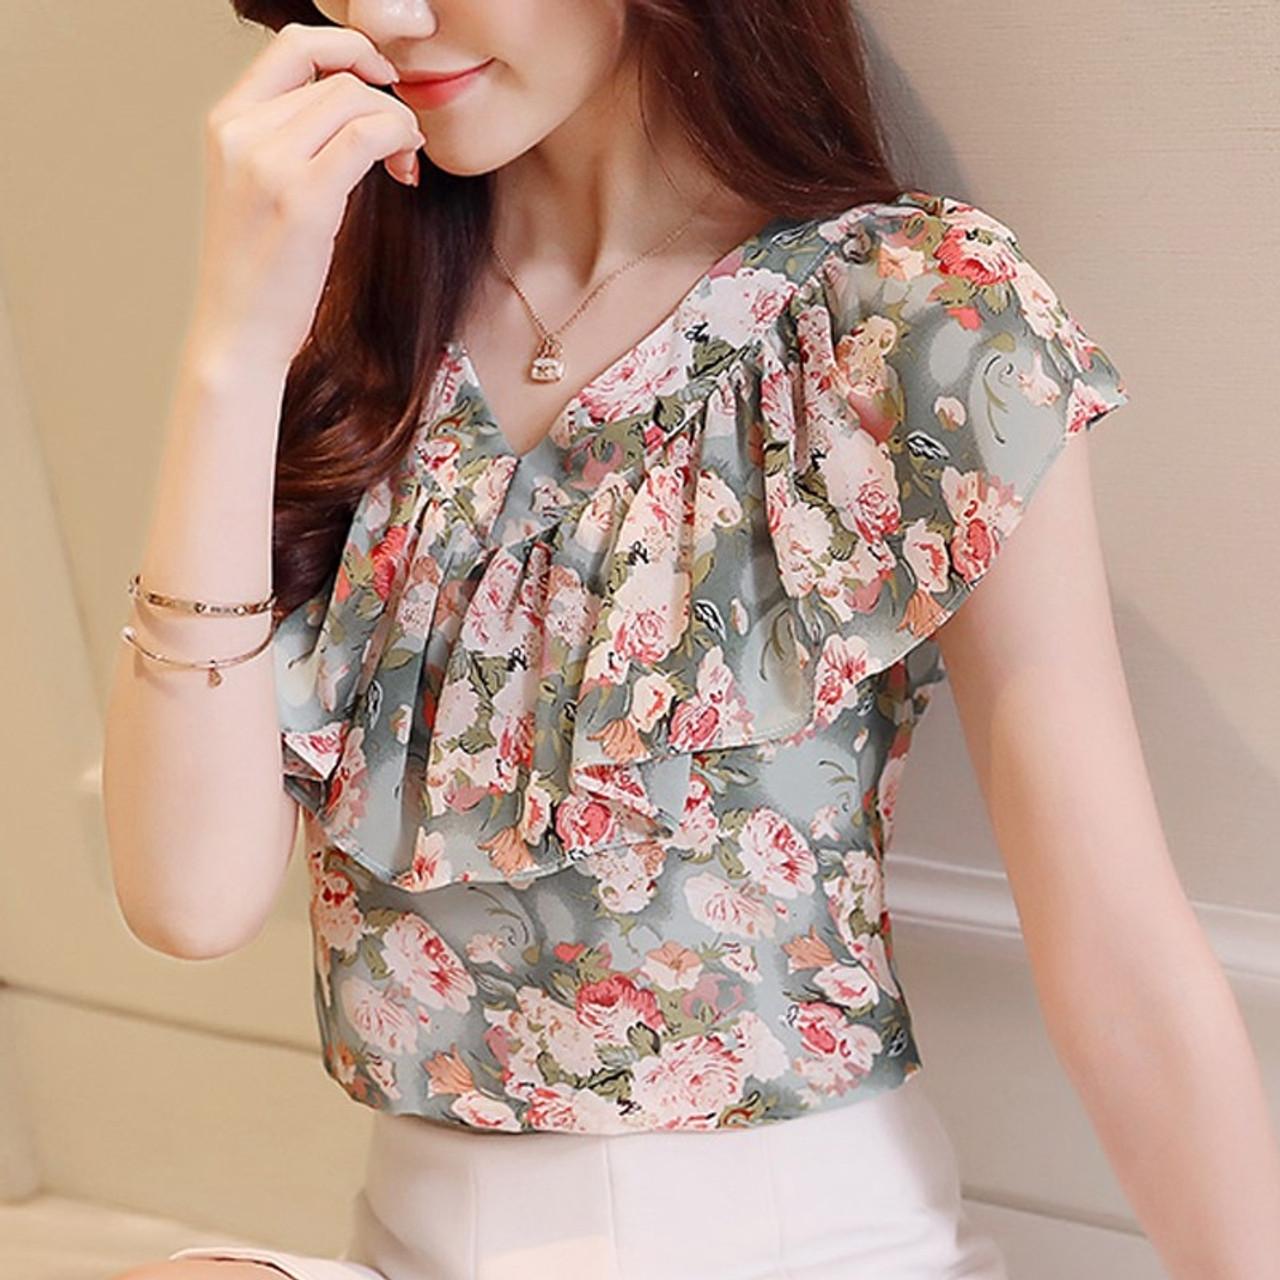 92a3c38f3e01 ... 2018 Fashion Summer Blouses Women Shirts Plus Size Floral Tops Ladies  Short Sleeve Chiffon Blusas Feminina ...